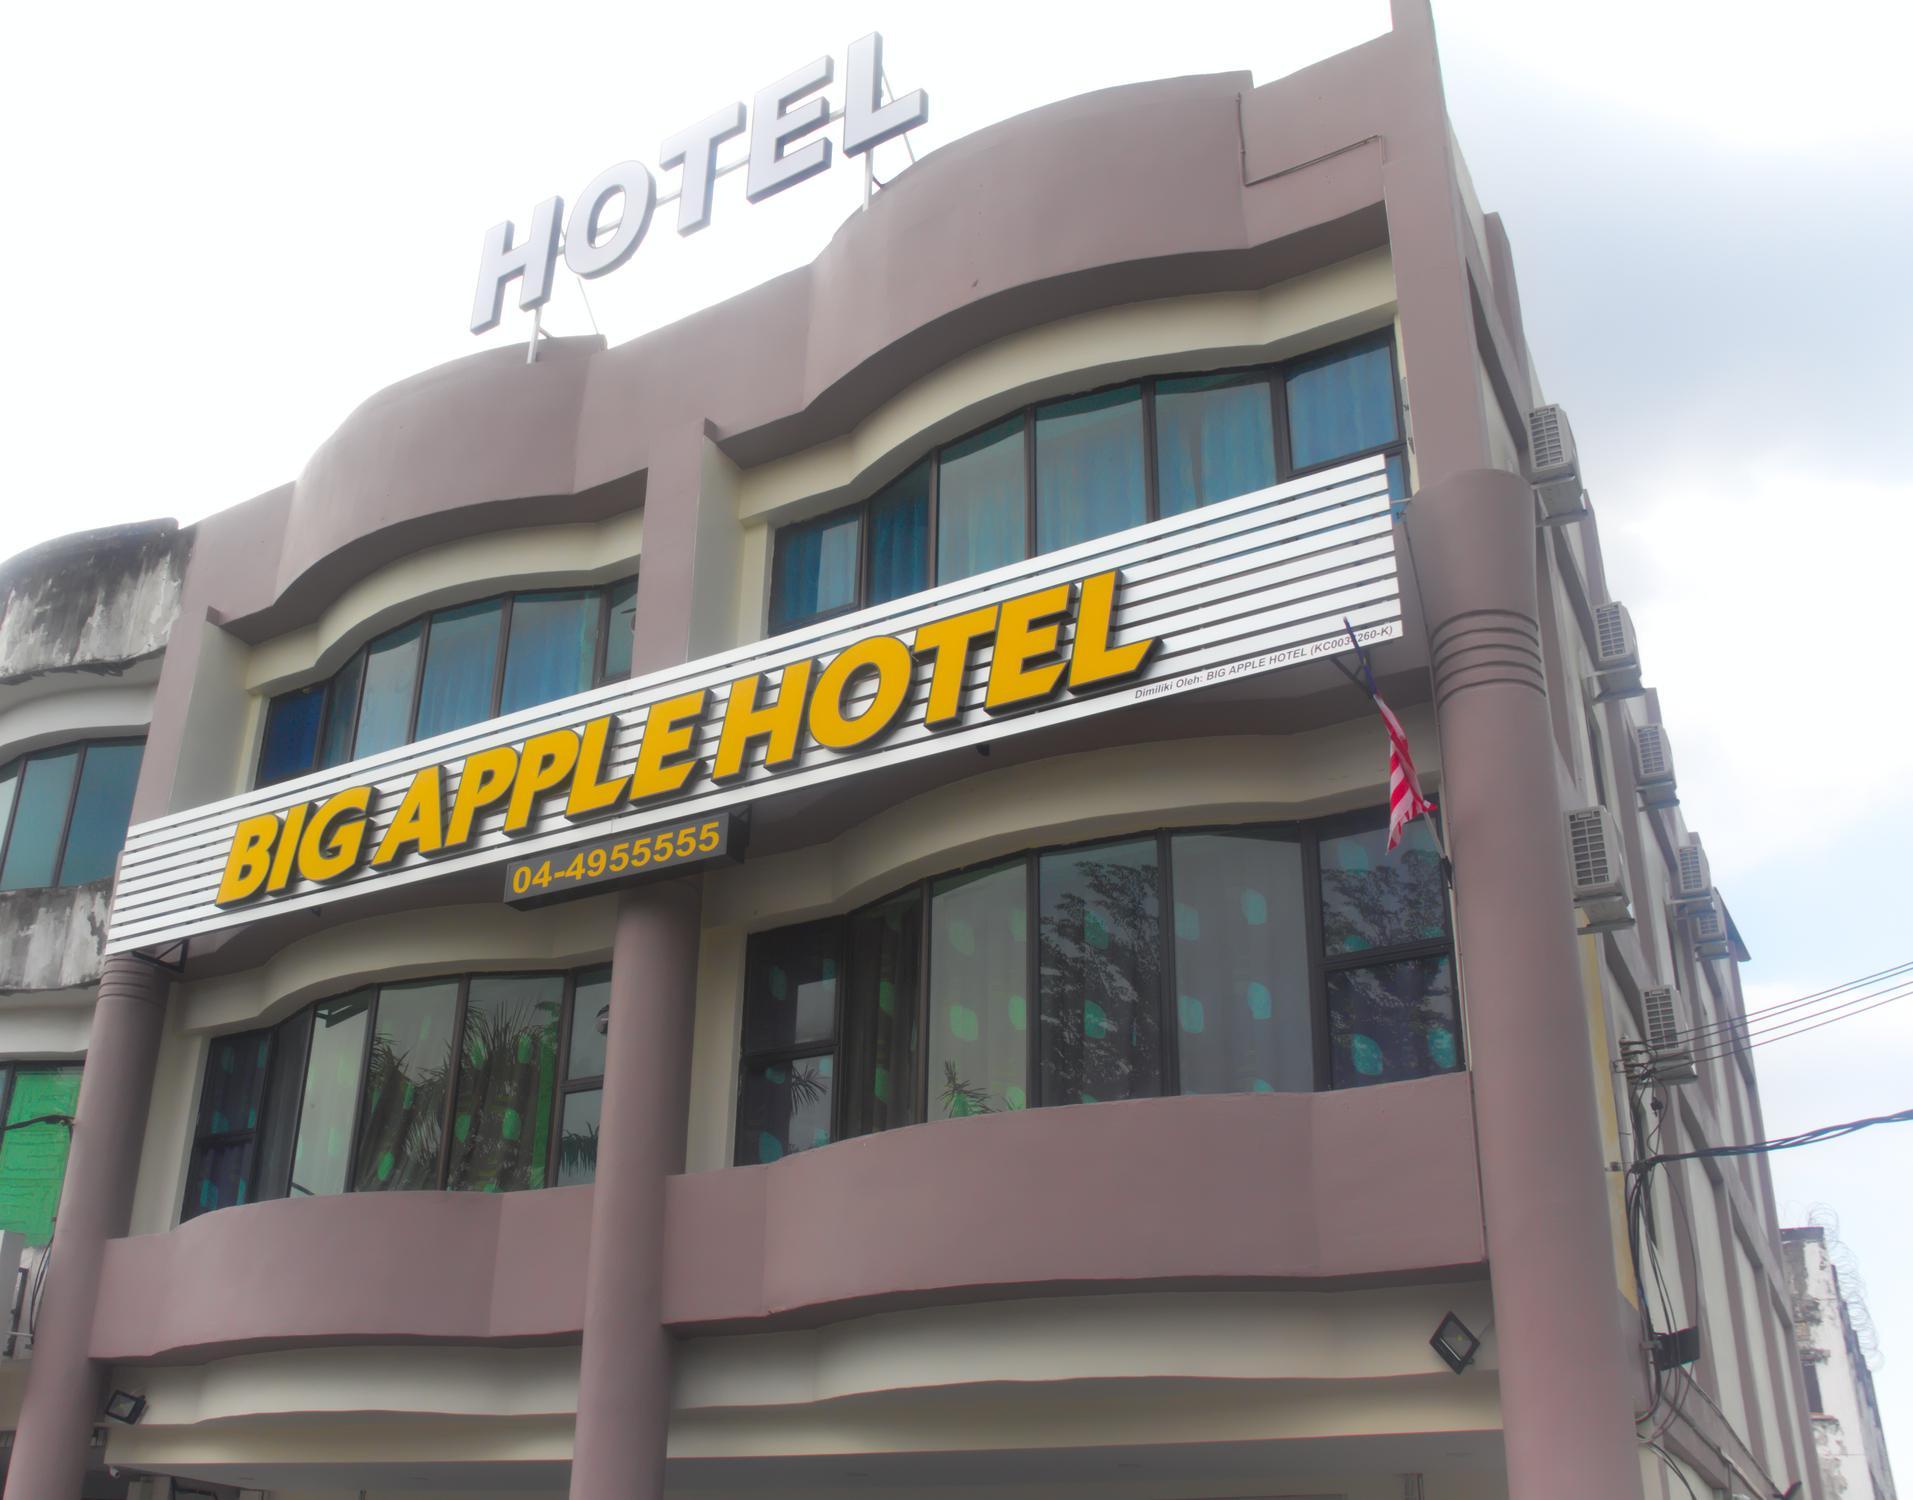 Big Apple Hotel